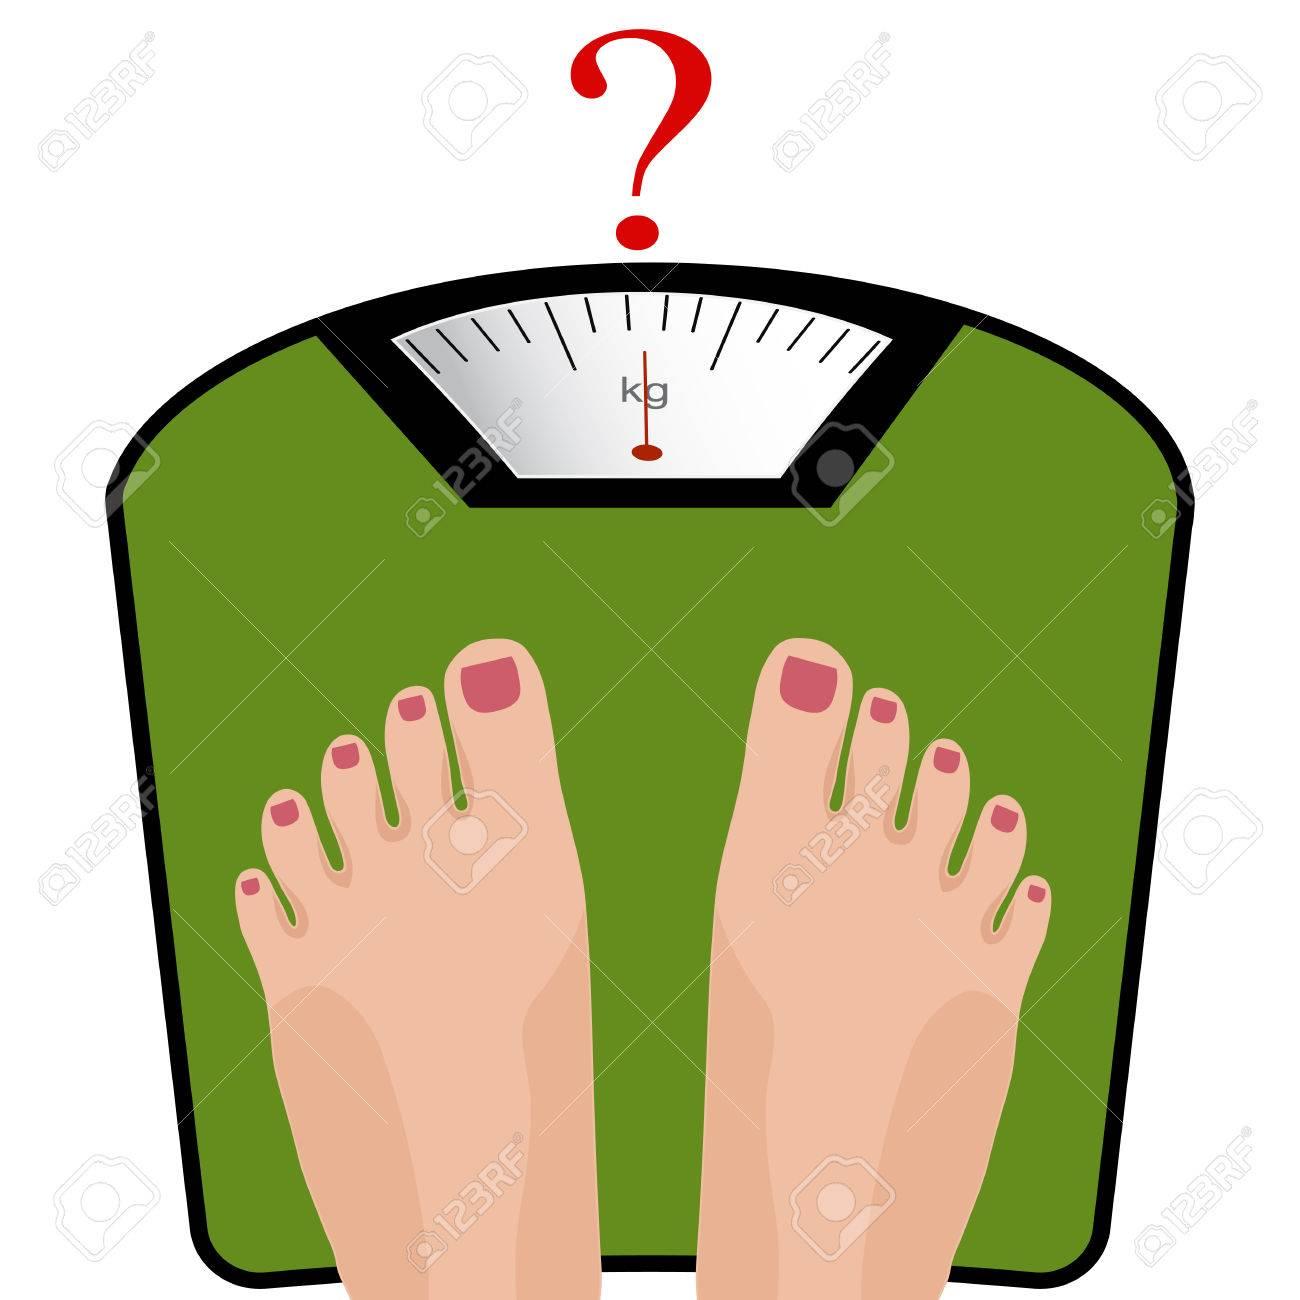 Chirurgie bariatrique (perte de poids)